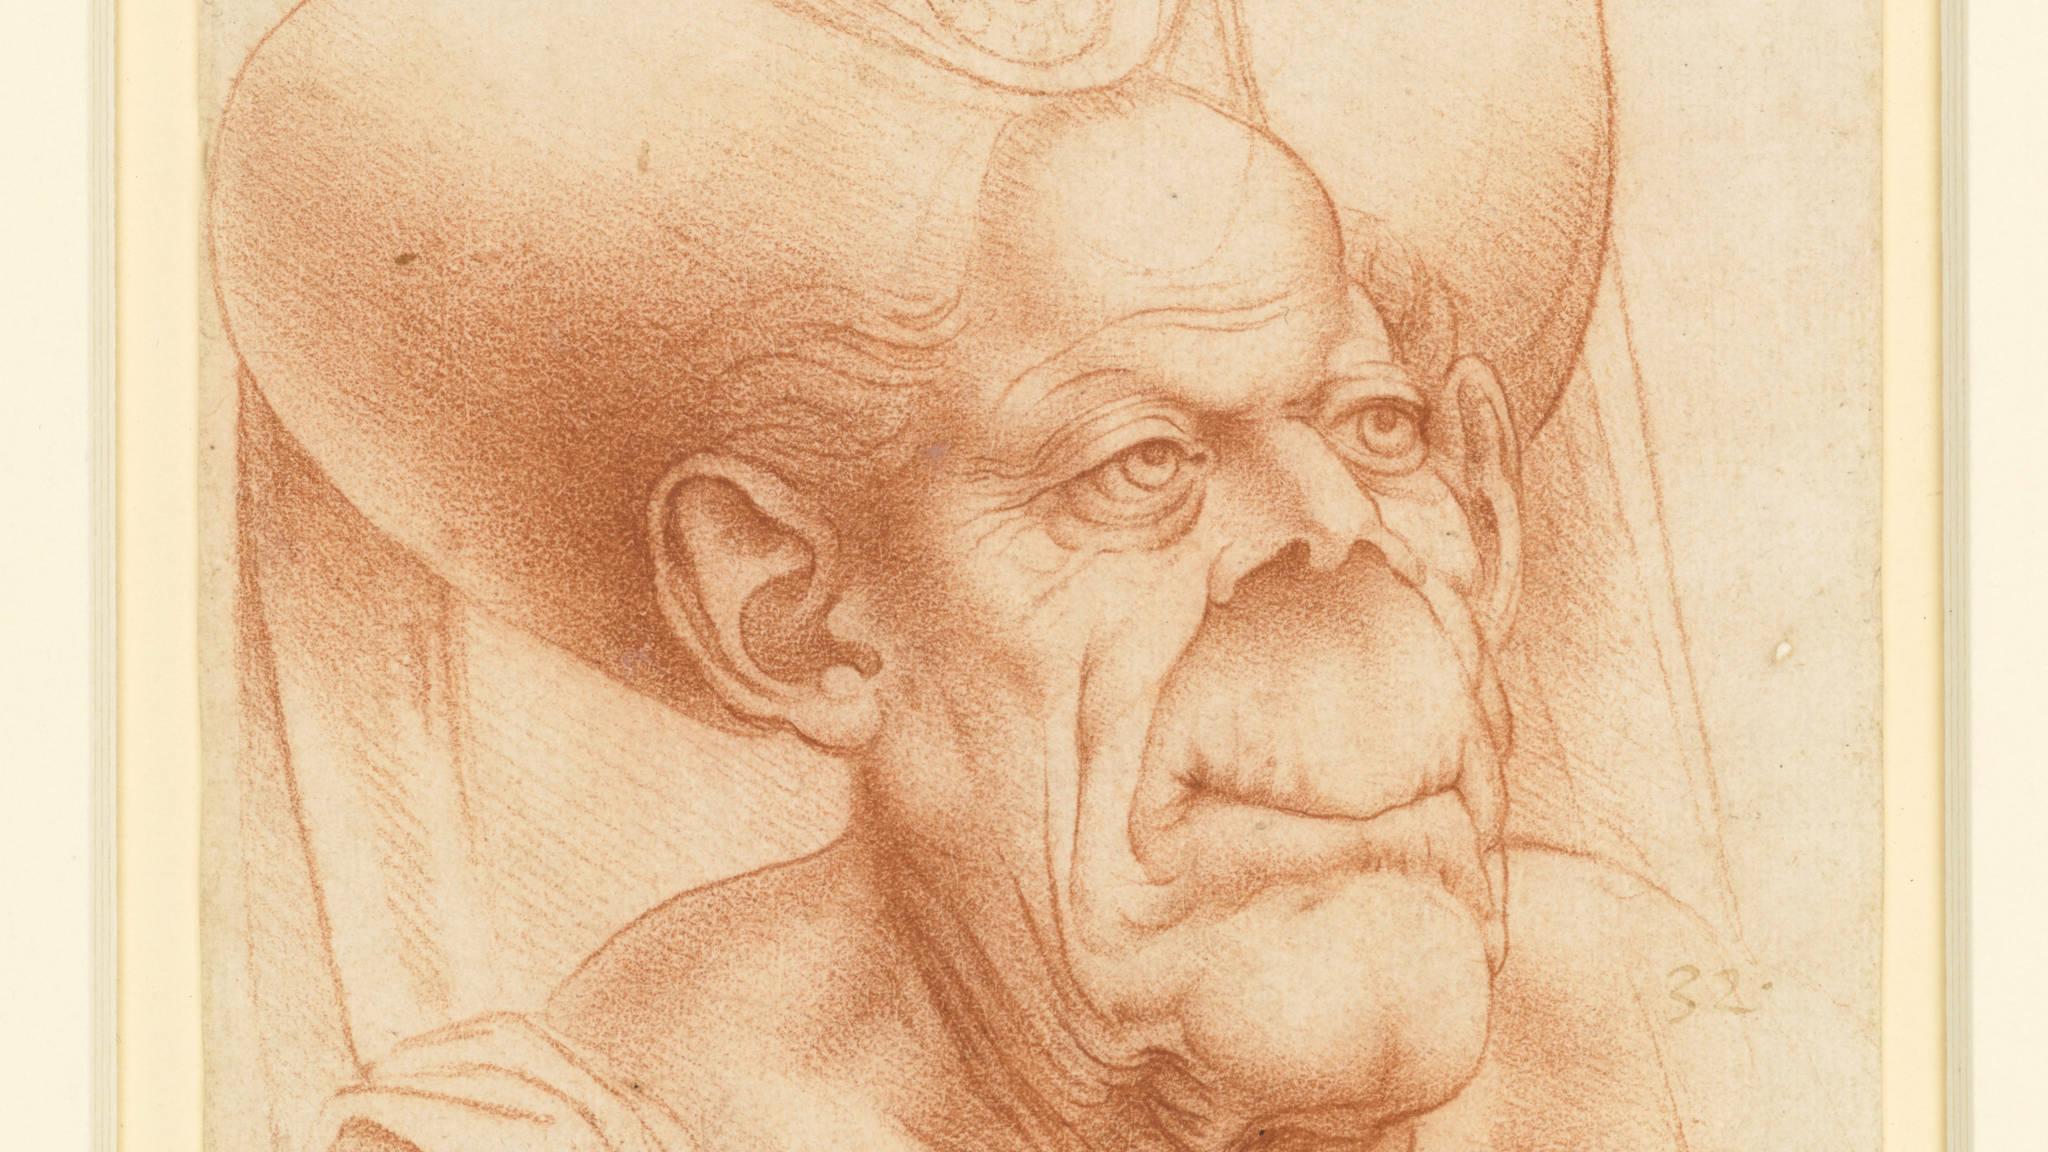 Caricature by Leonardo da Vinci. Royal Collection Trust / © Her Majesty Queen Elizabeth II 2018